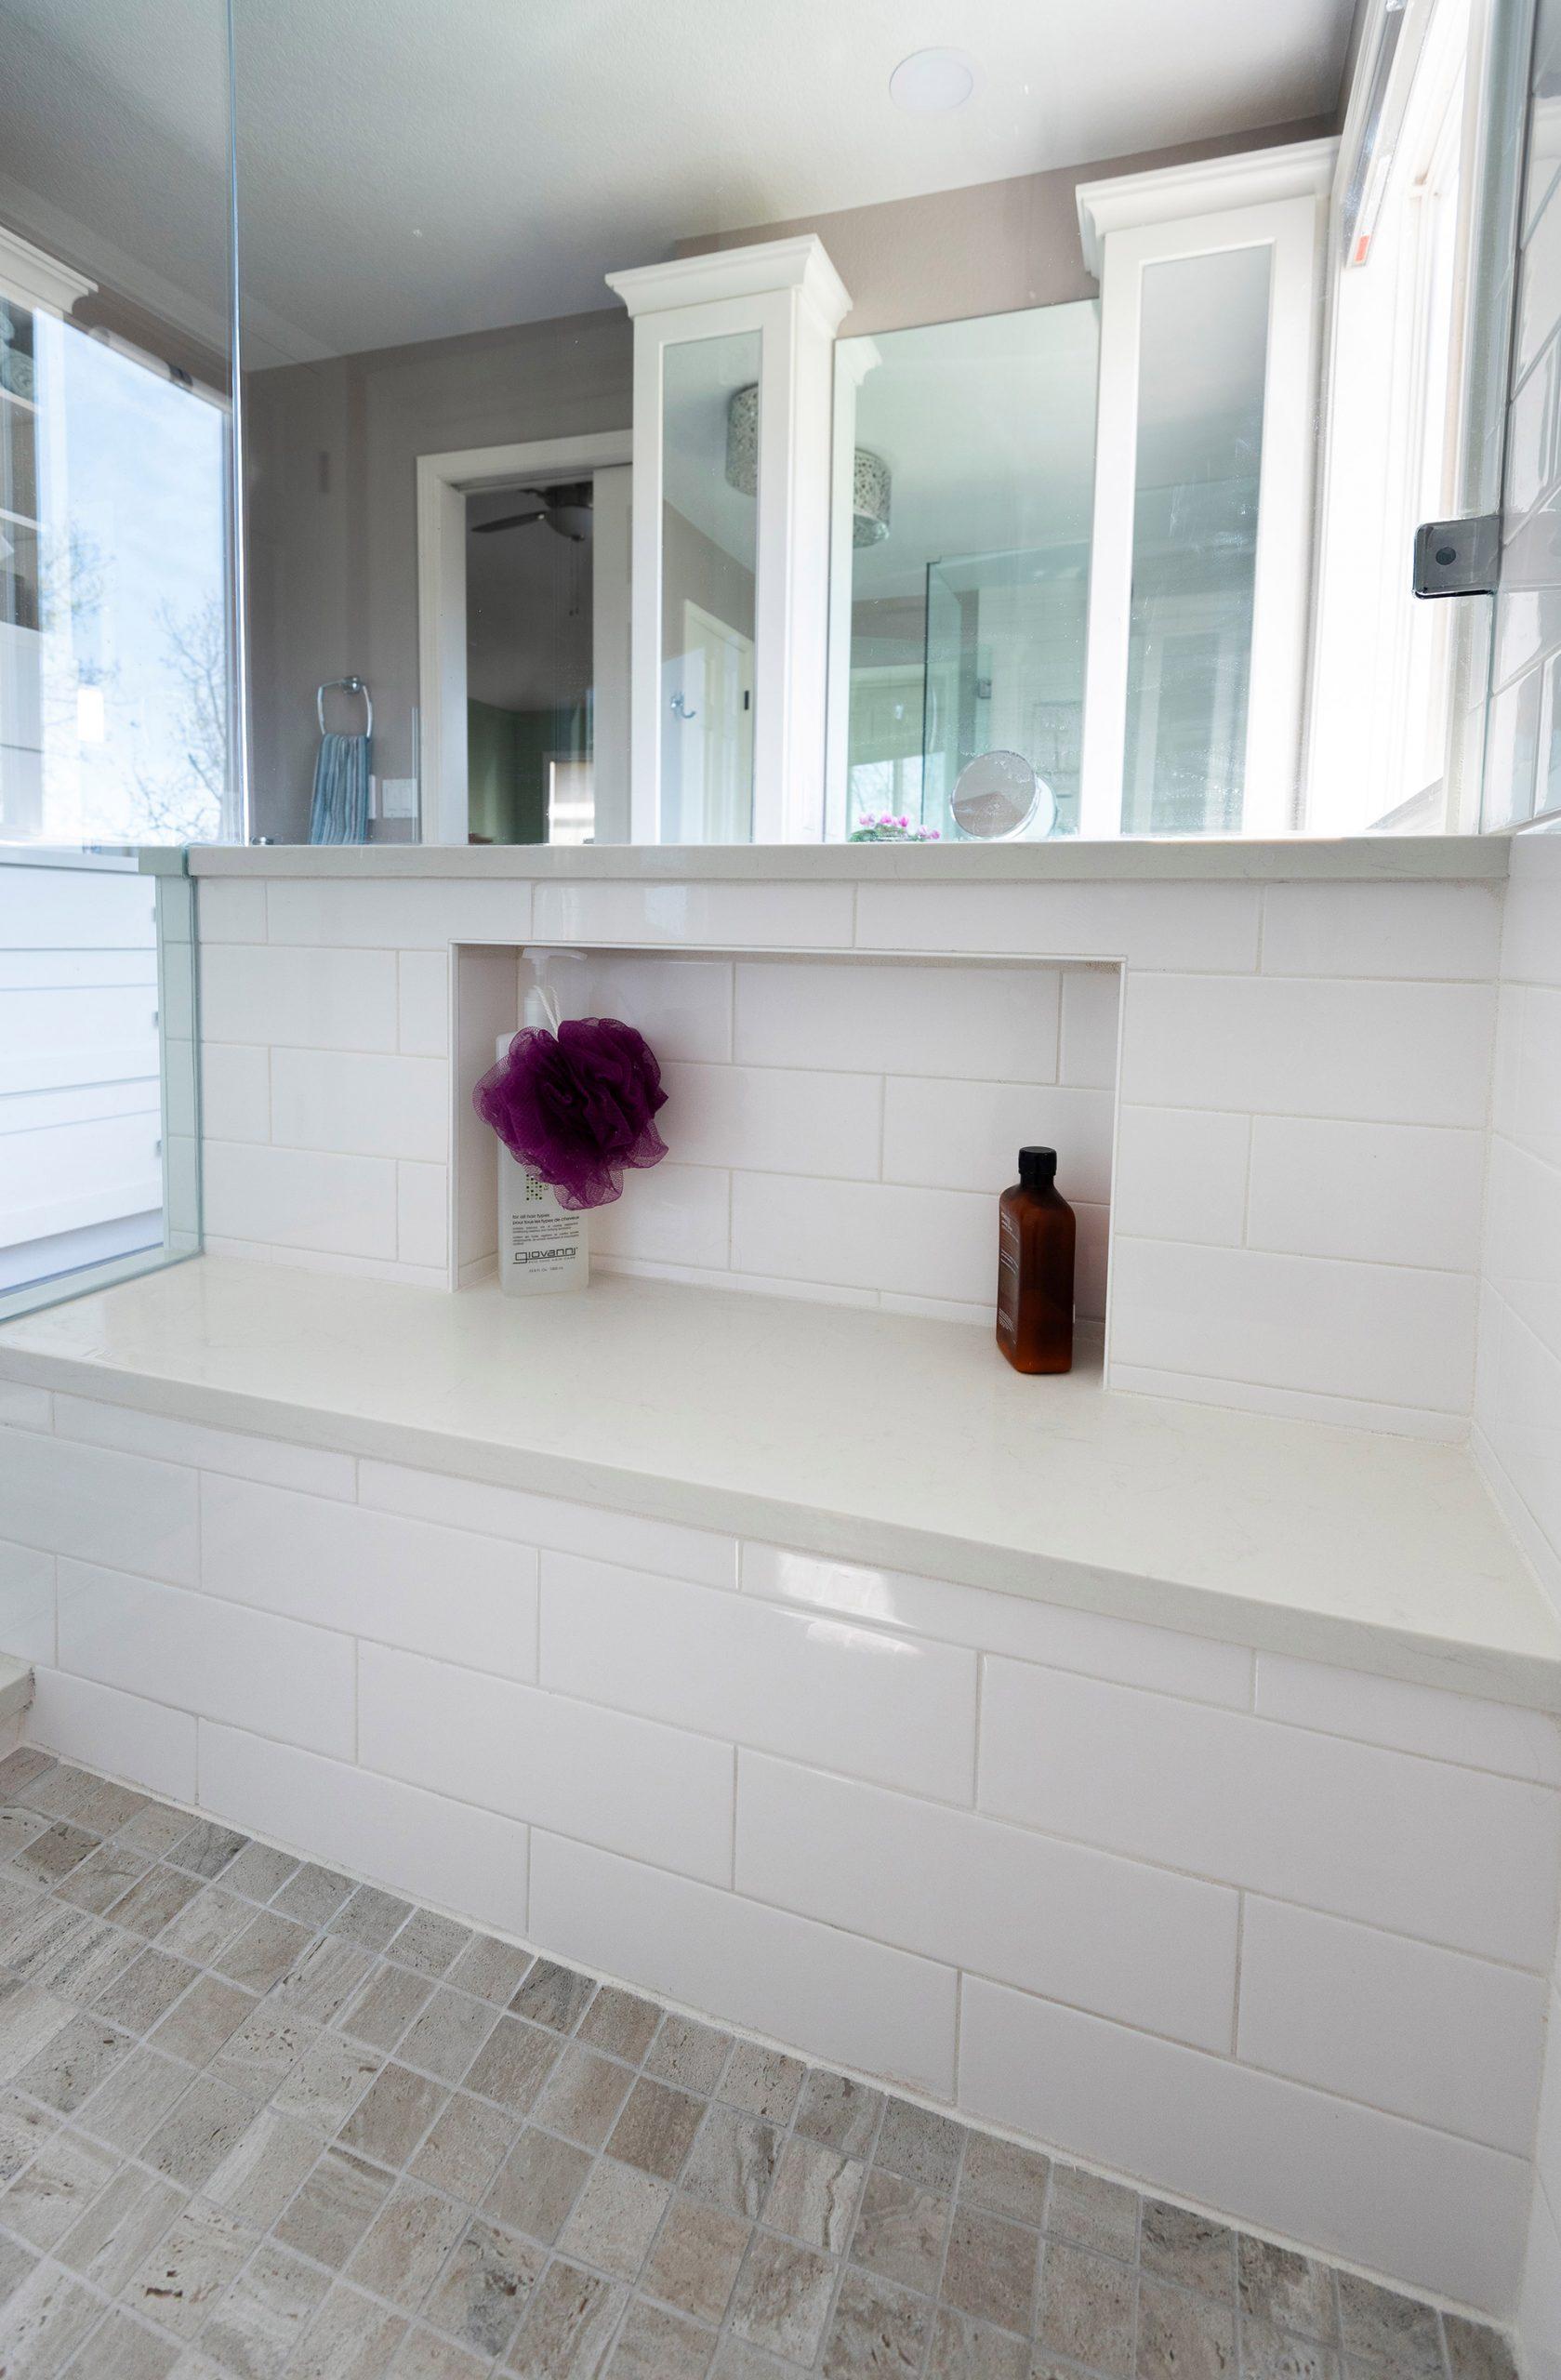 20190503_mccarty-bathroom-18-crop